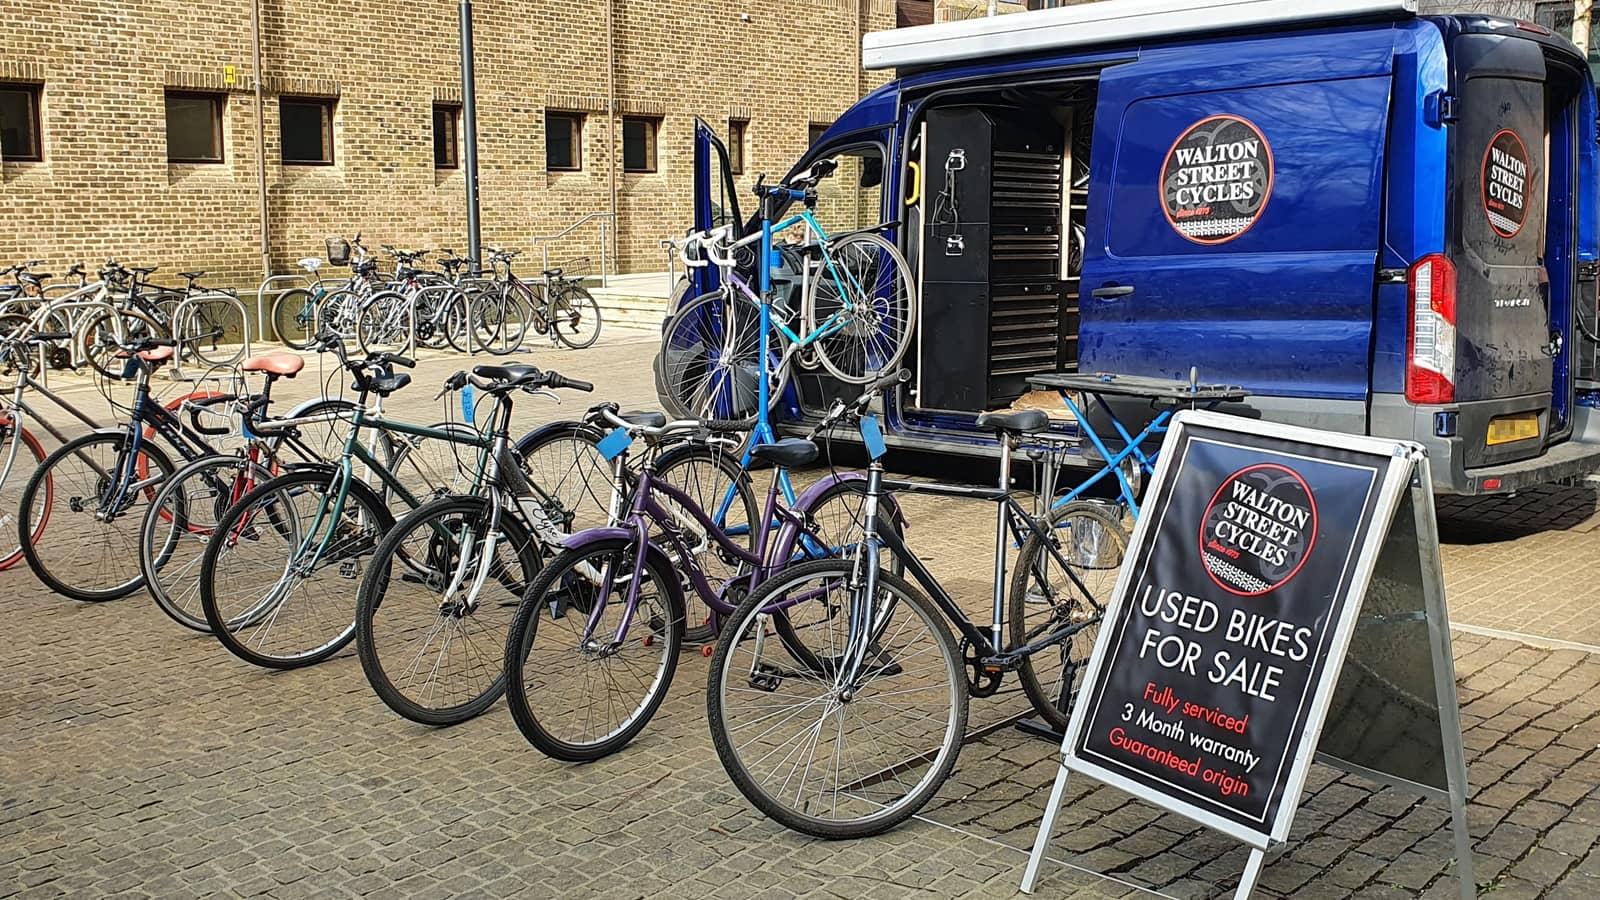 Oxford Used Bikes